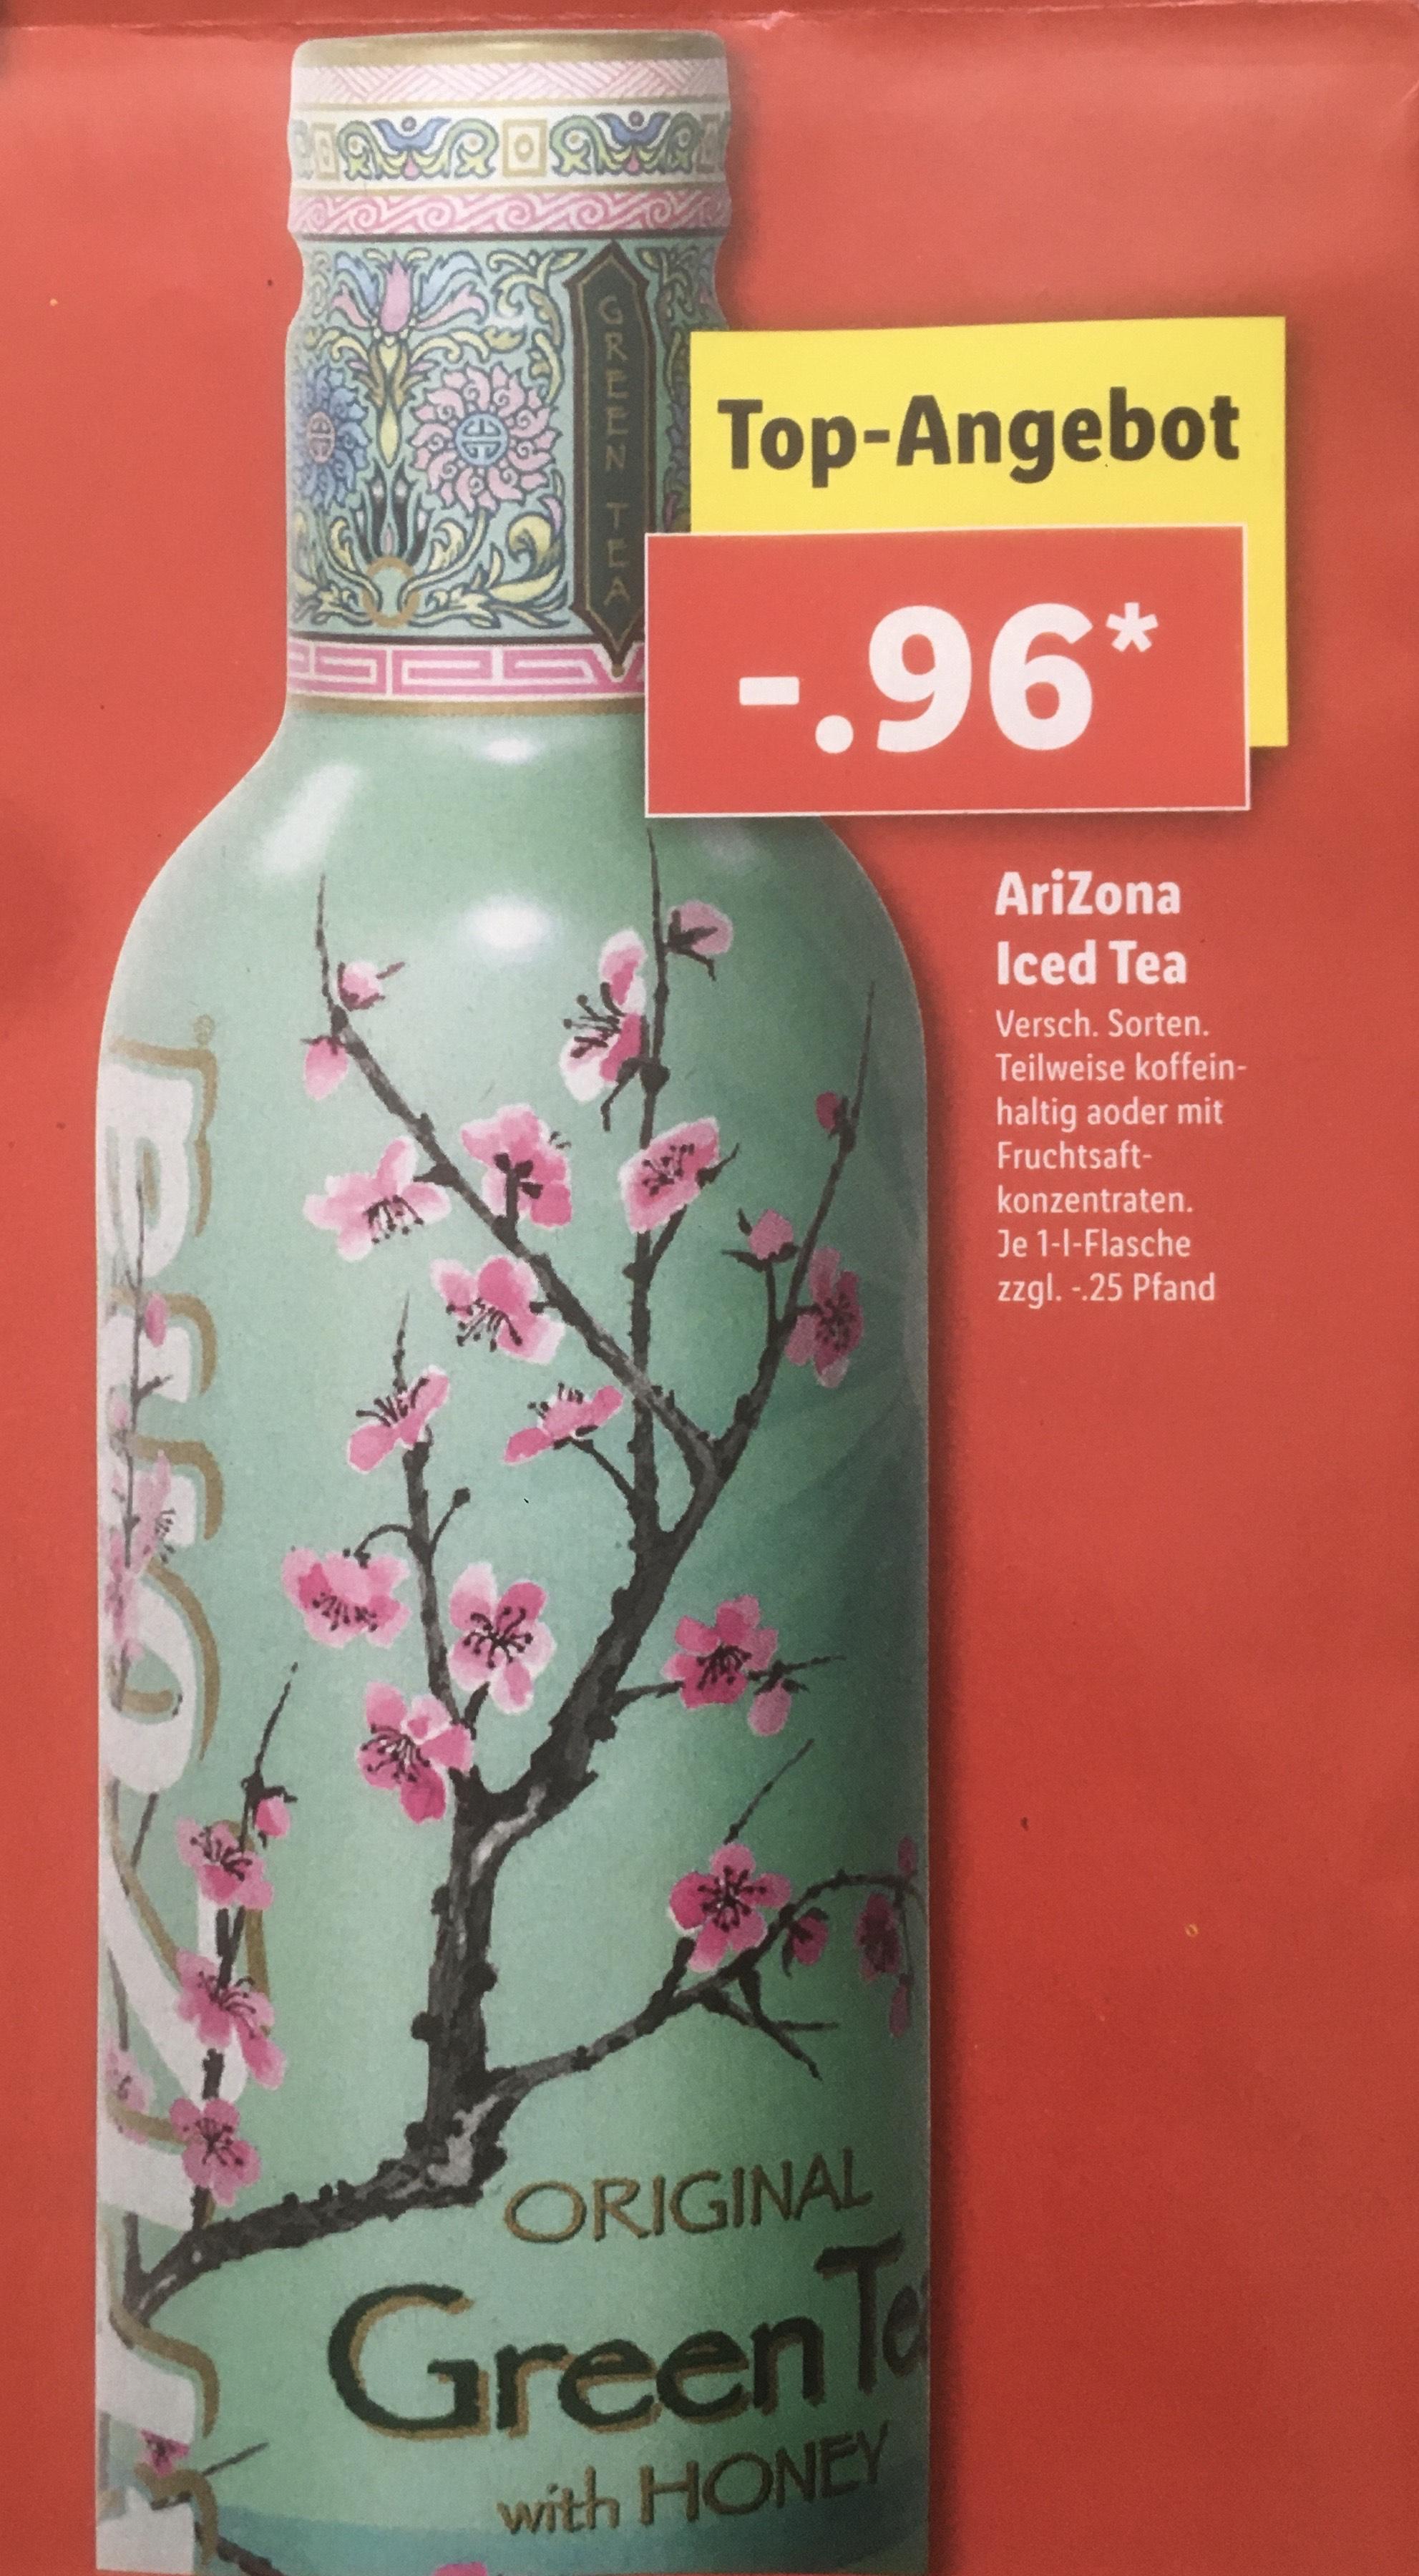 [Lidl] AriZona Iced Tea 1 Liter für 96 Cent